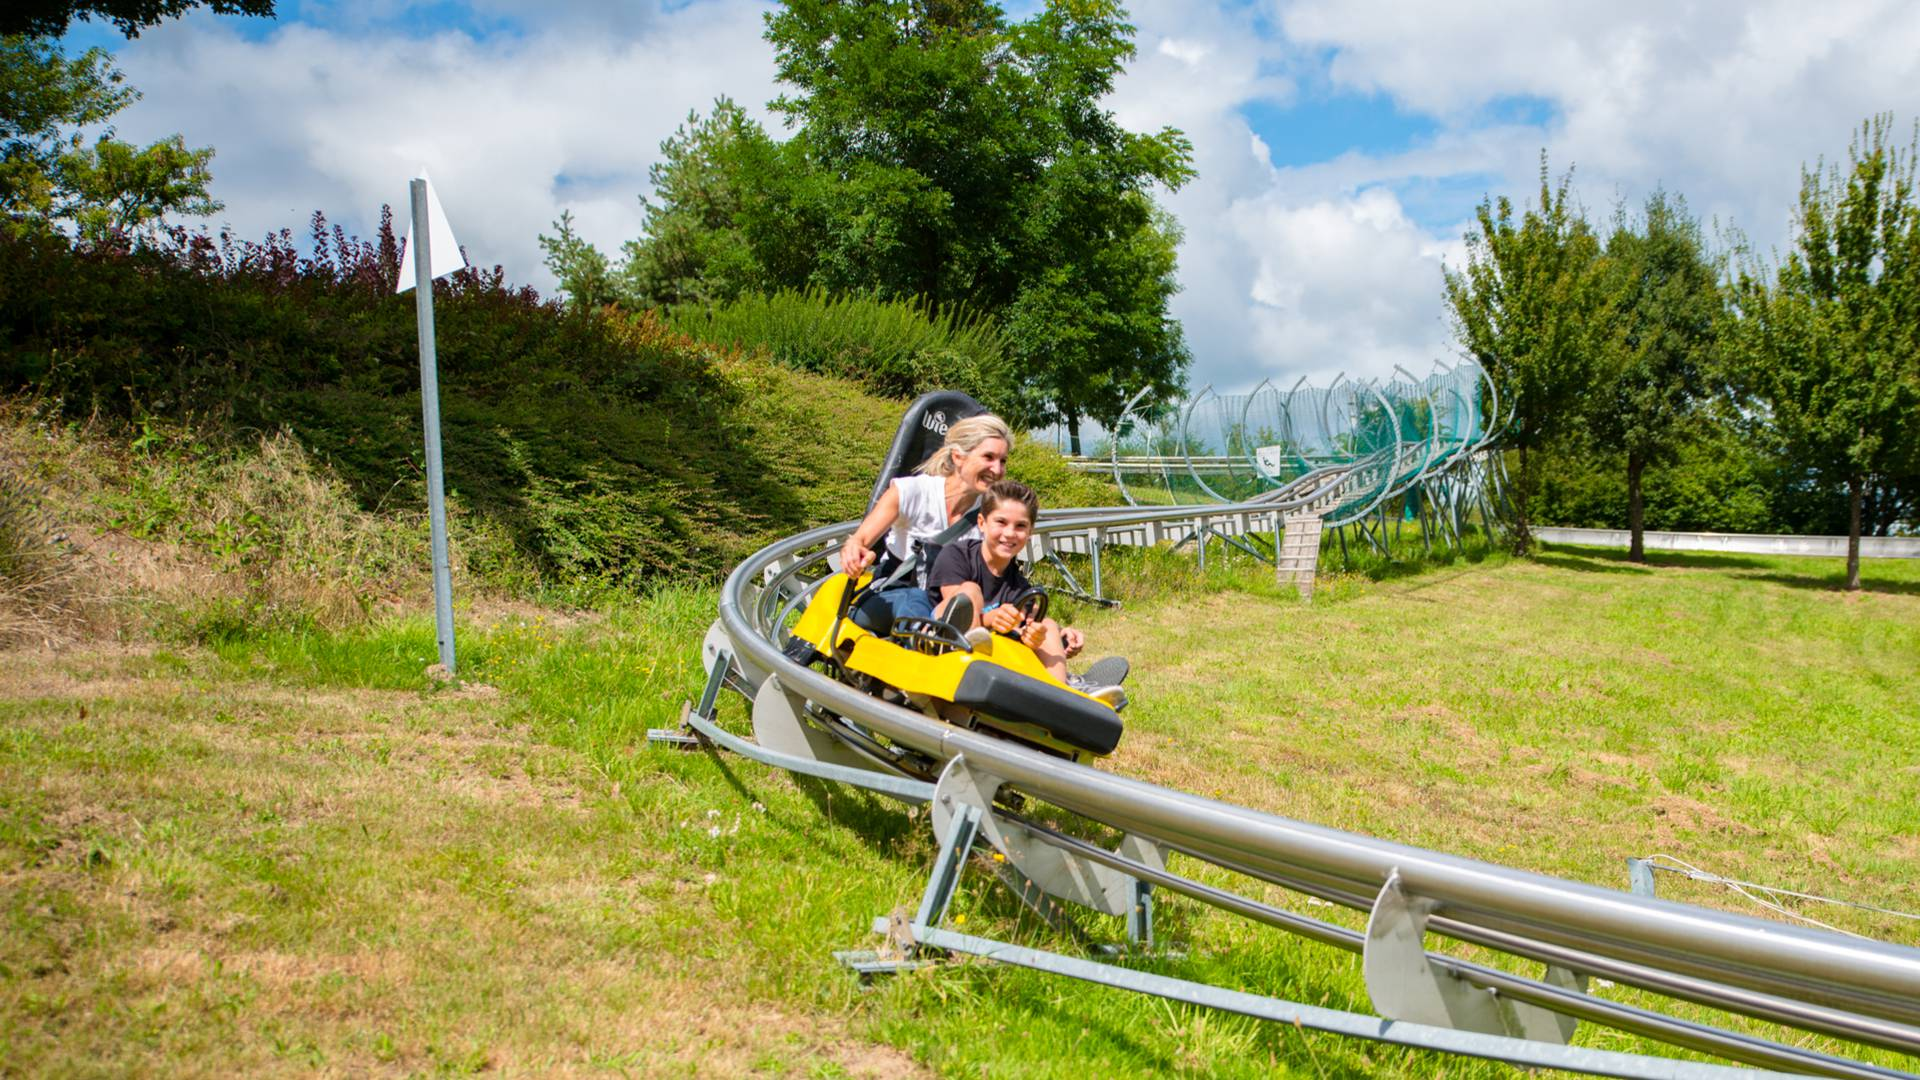 L'Alpine Coaster, attraction du Parc des Combes, Le Creusot. © Franck Juillot.